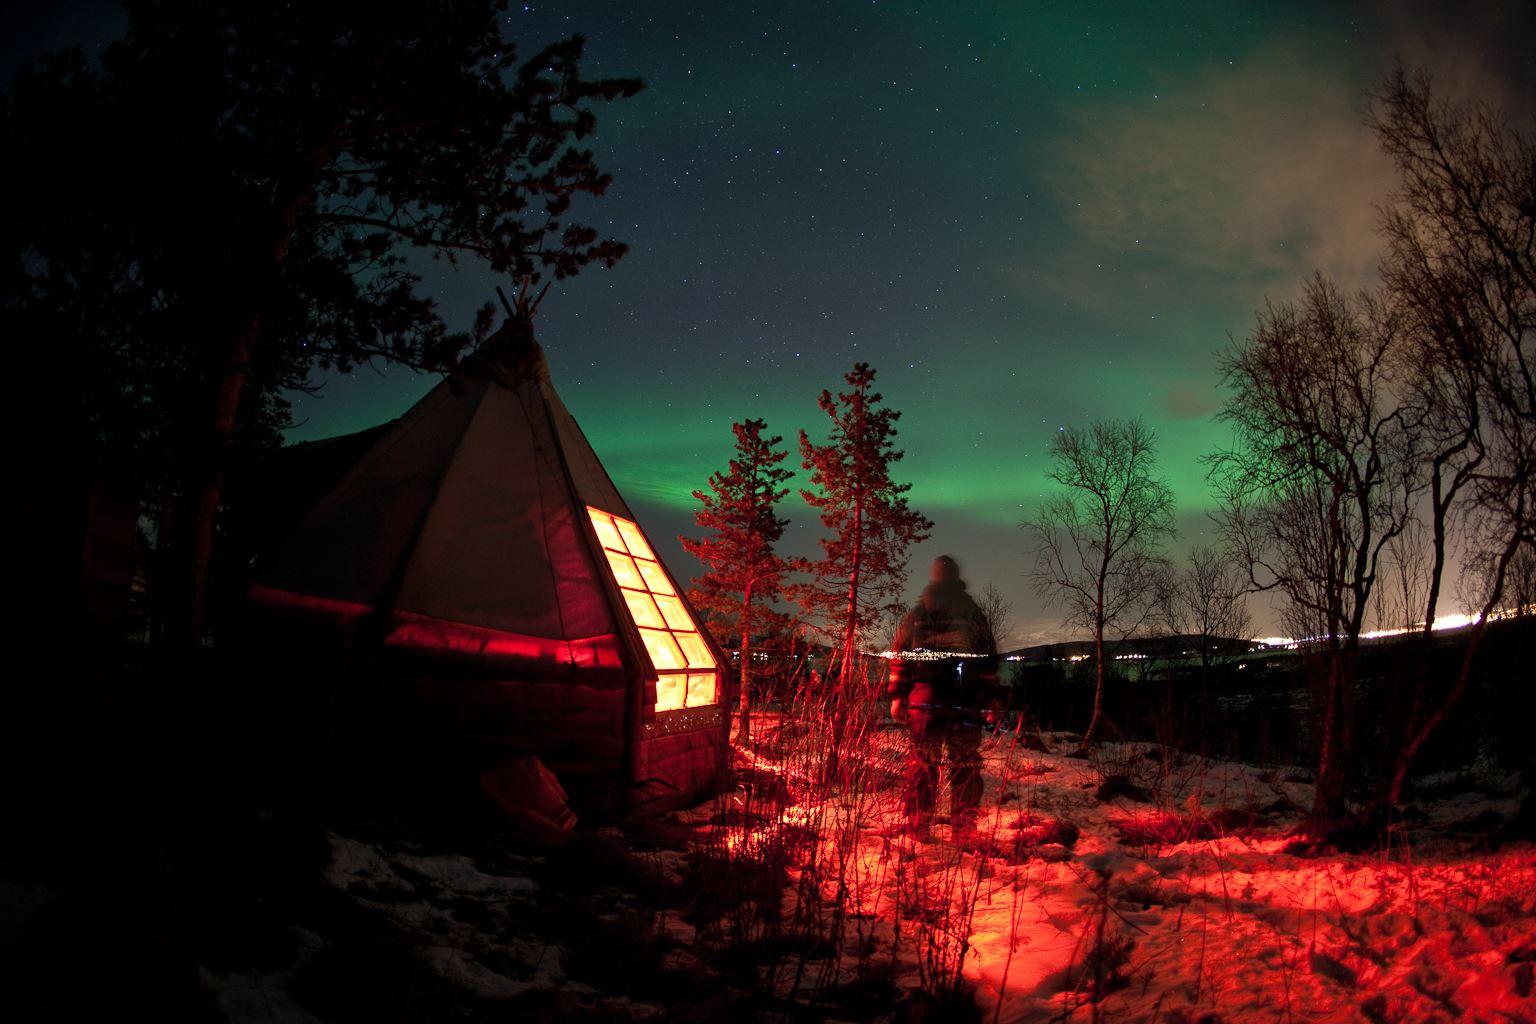 Nordlysbesøk hos Huskyene - Tromsø Villmarkssenter